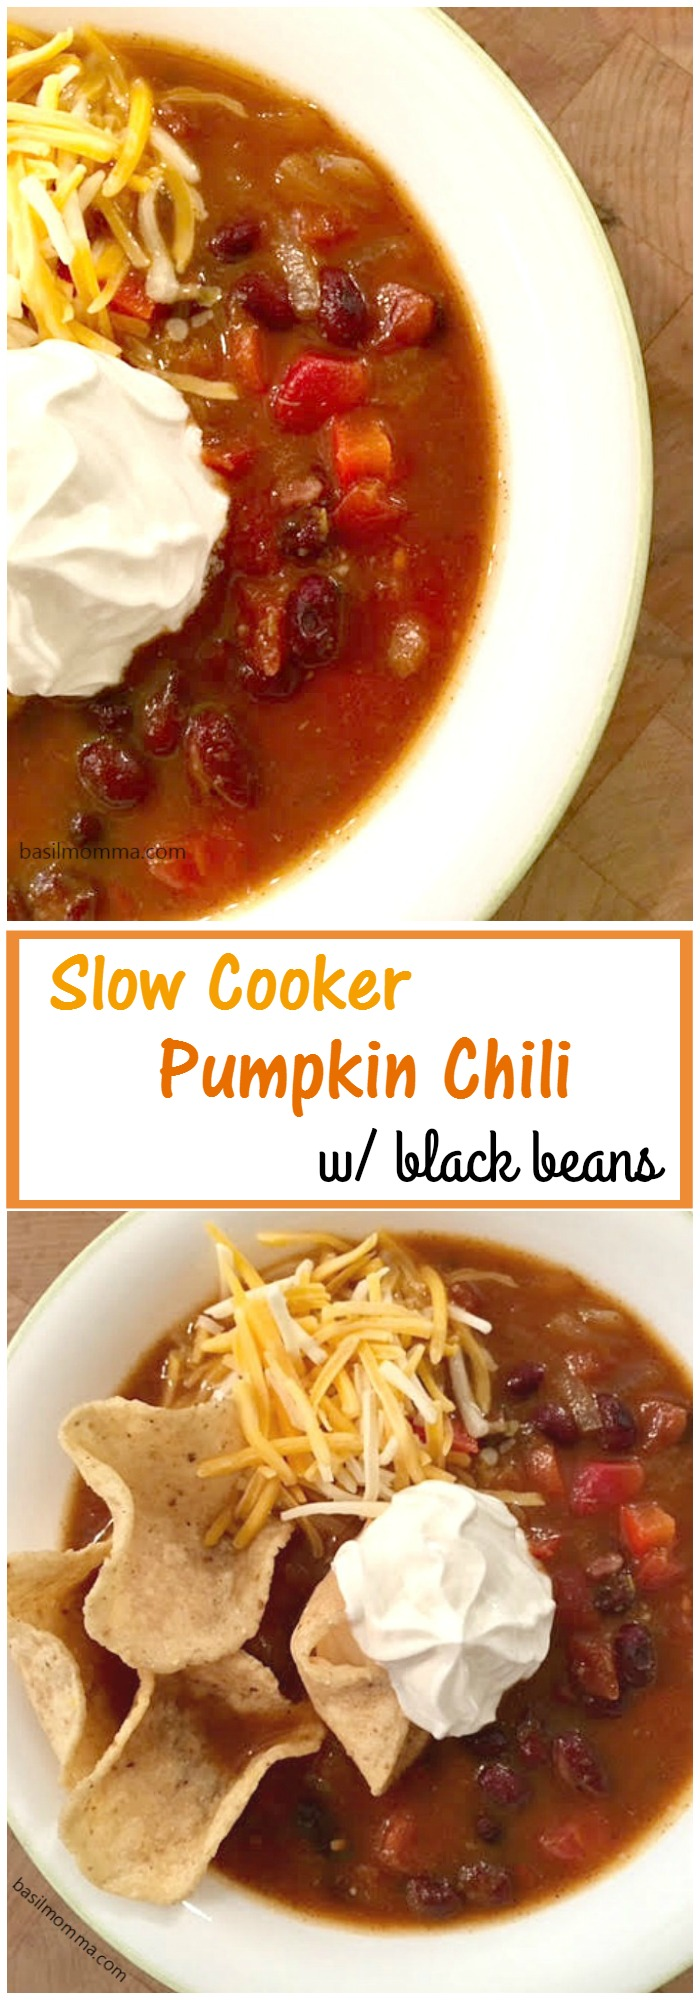 Slow Cooker Black Bean Pumpkin Chili Basilmomma